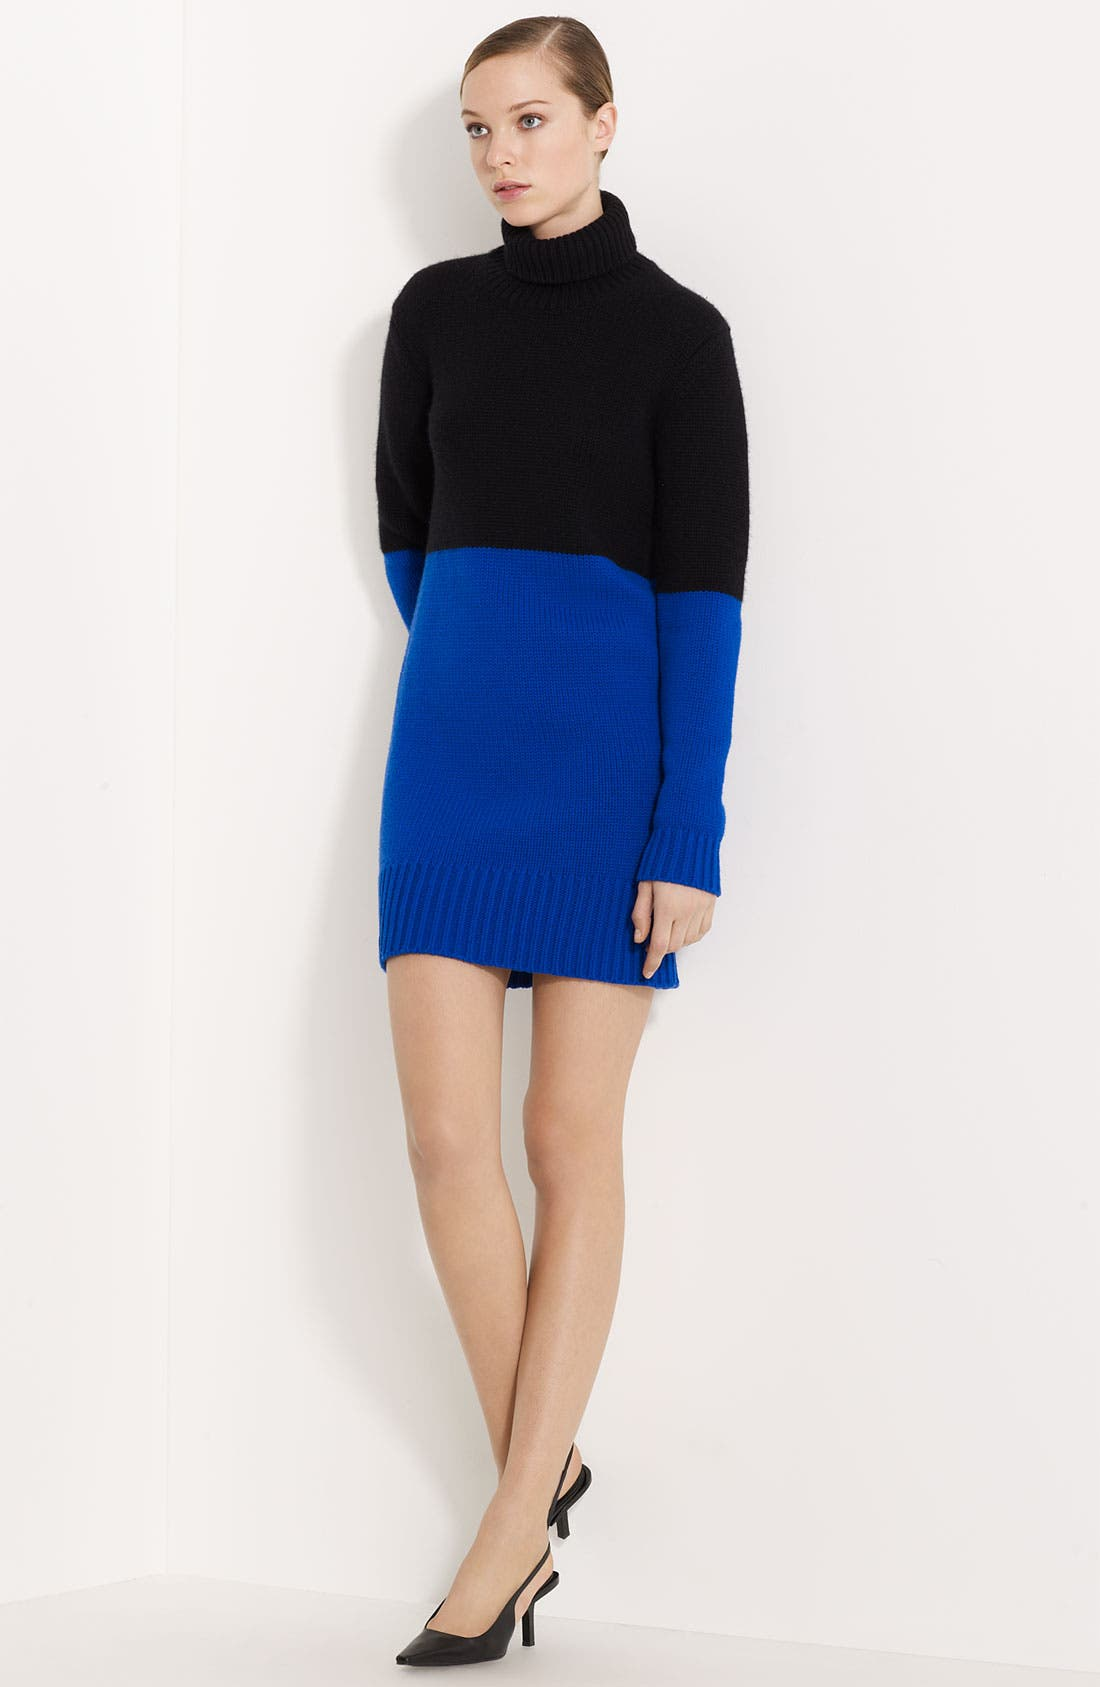 Main Image - Michael Kors Colorblocked Cashmere Dress